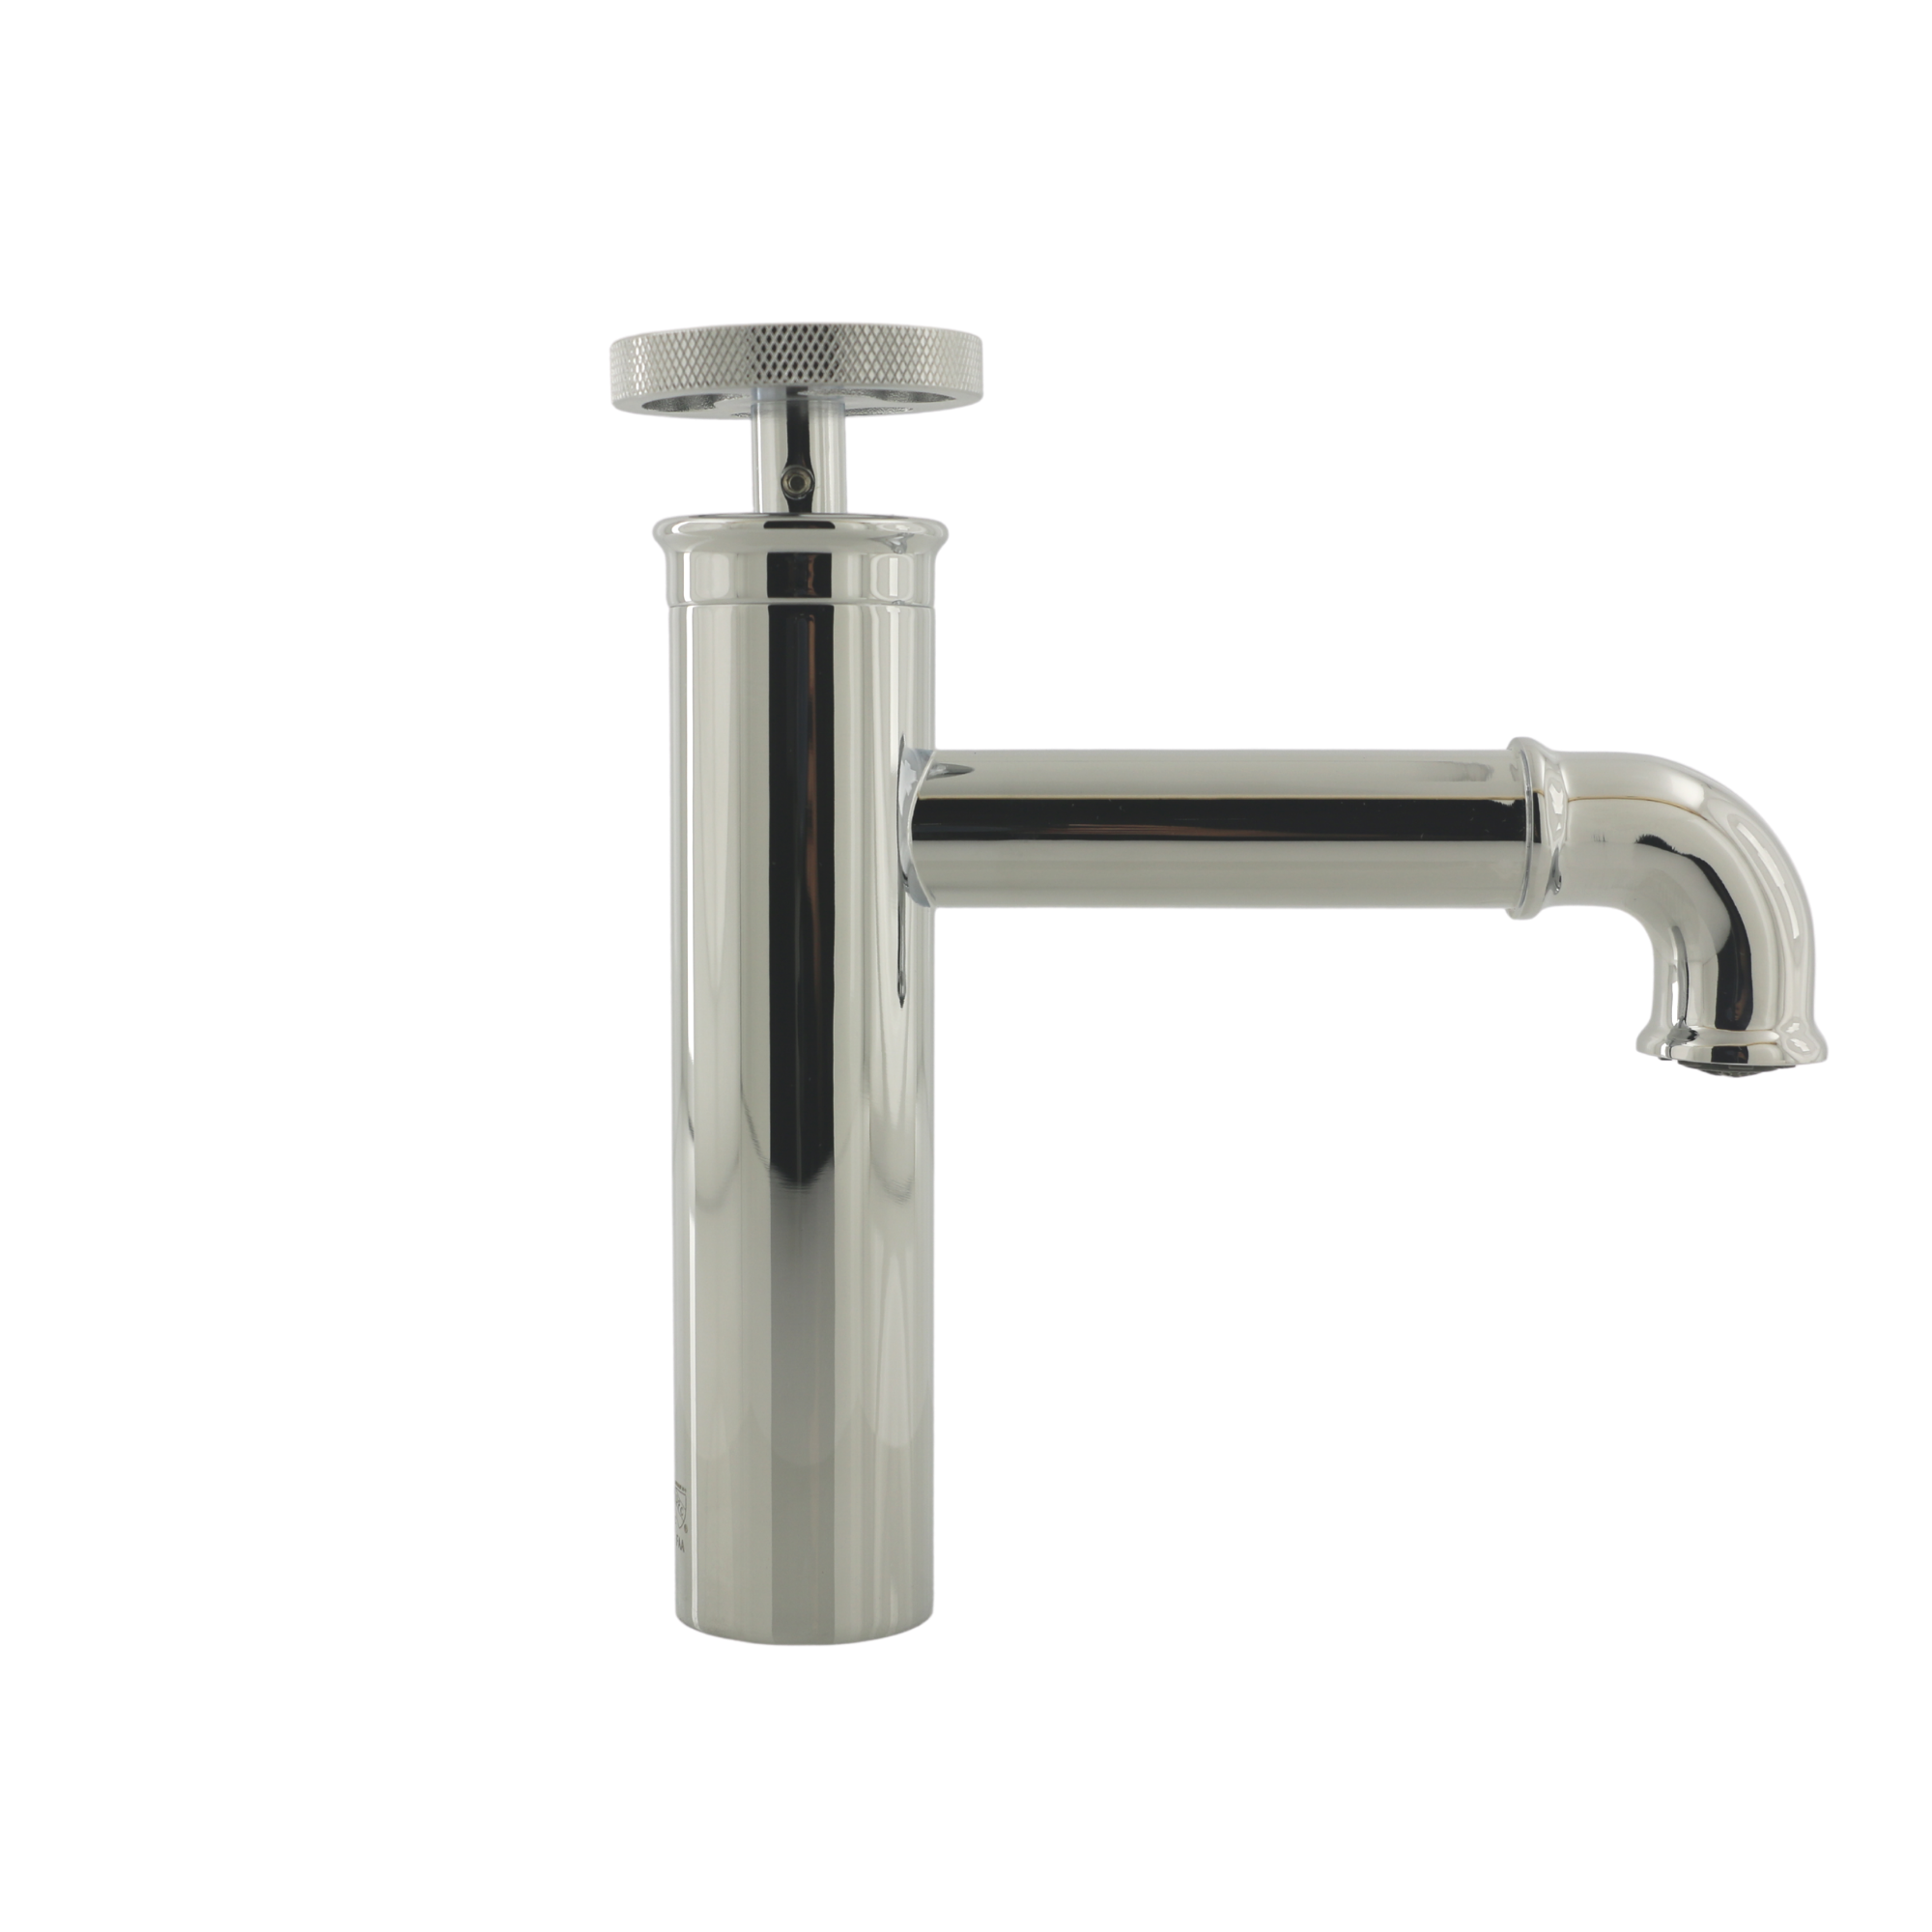 Aquaart Single Handle Lav Faucet